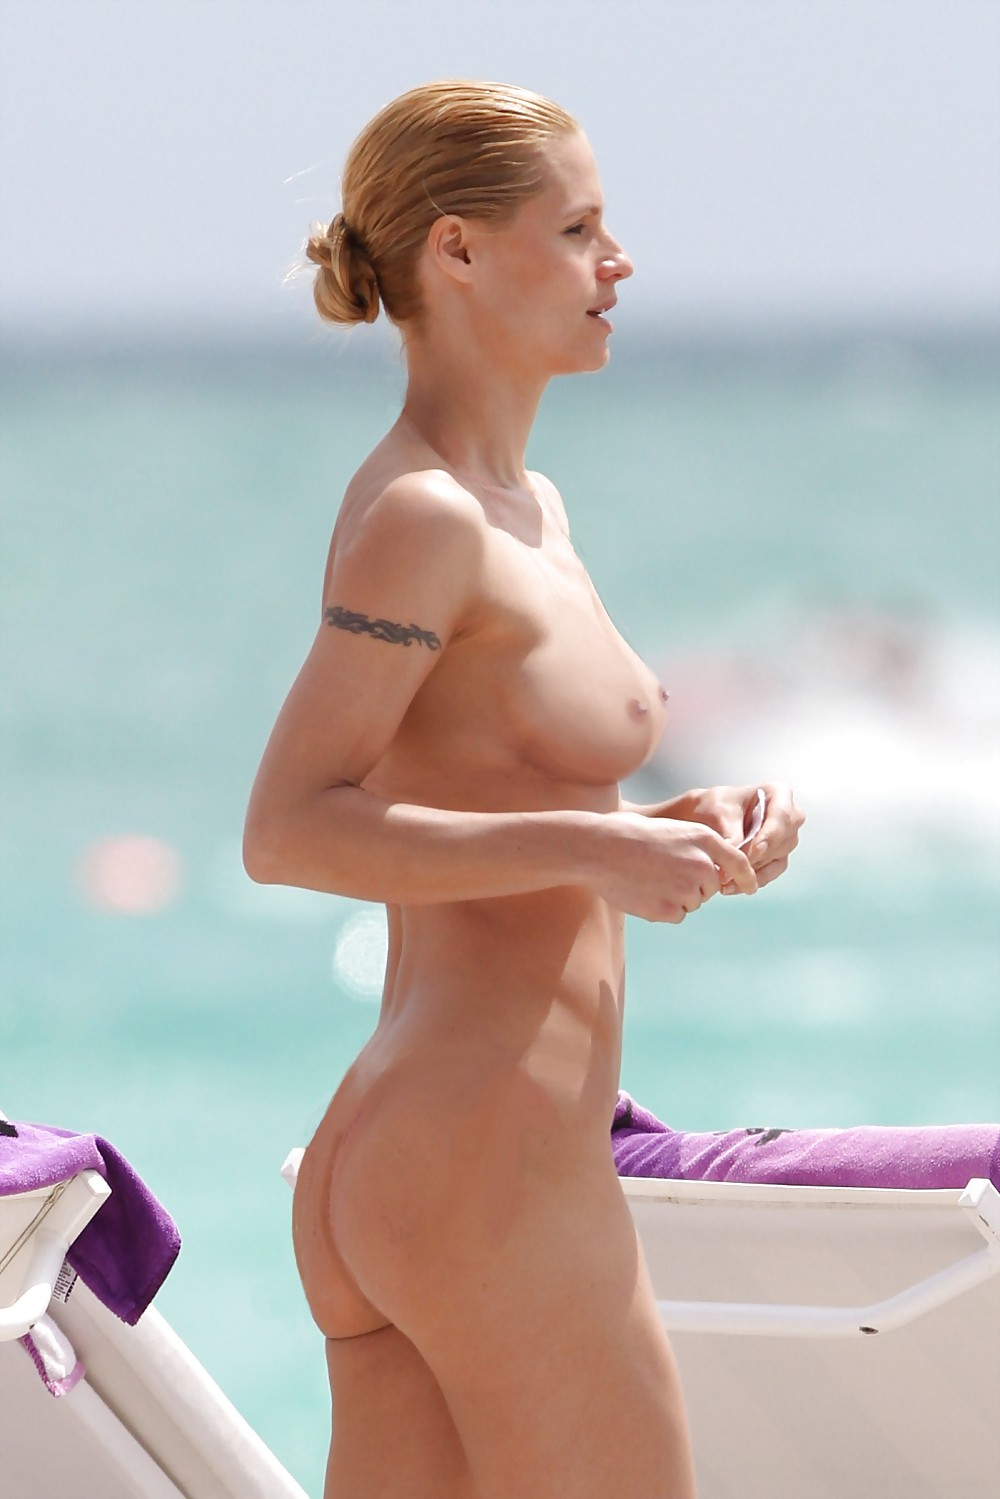 bikini Celebtrity in